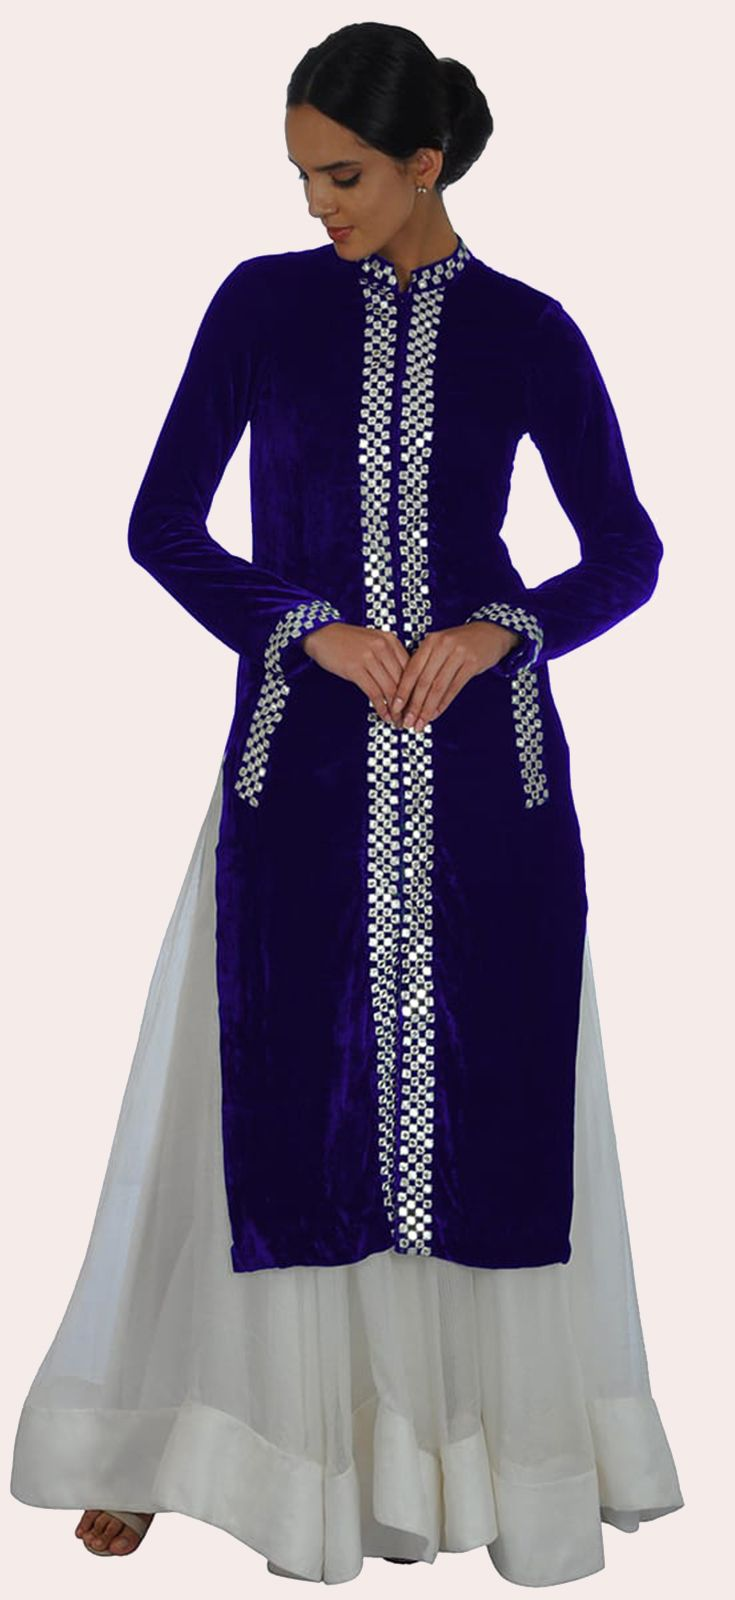 Eid 2017 Collection: Electric Blue Silk-Velvet with Mirror Work Sherwani - Full Flared Skirt